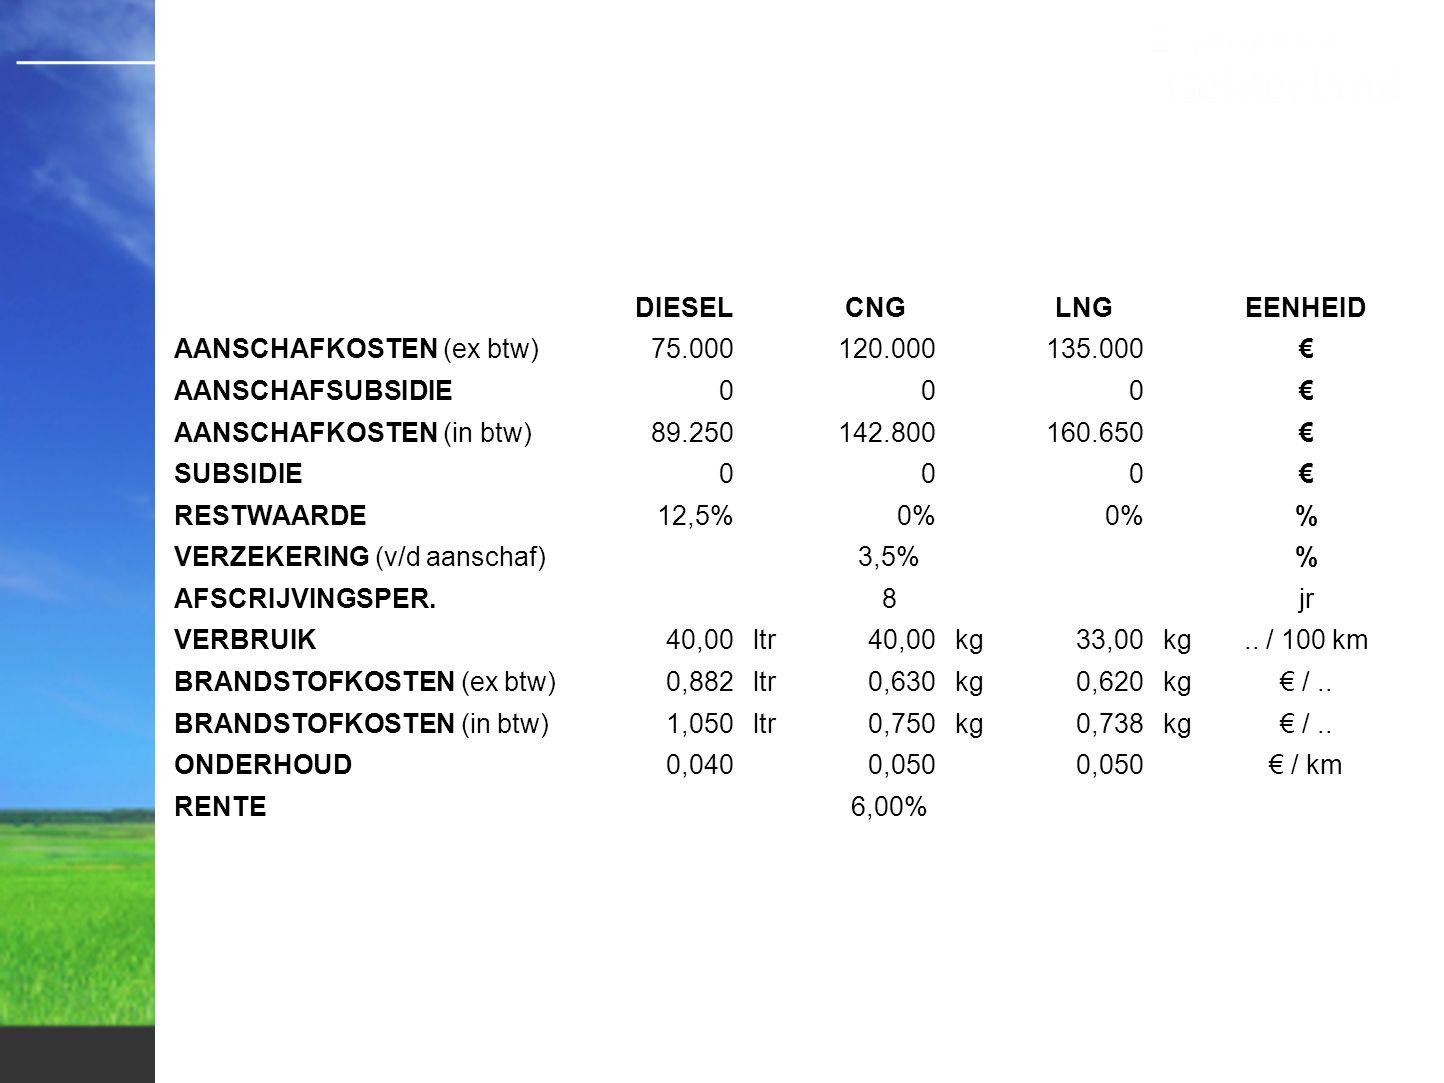 Kosten pompstation TRUCKS VULPUNT tvt (in jr) tv (in trucks)tvt (in jr) km/jr Subsi- die € 10.000 LNGLNCGLNGLNCG 88.84386,6 133988 100.0006,75,6 123477 120.0005,34,4 102955